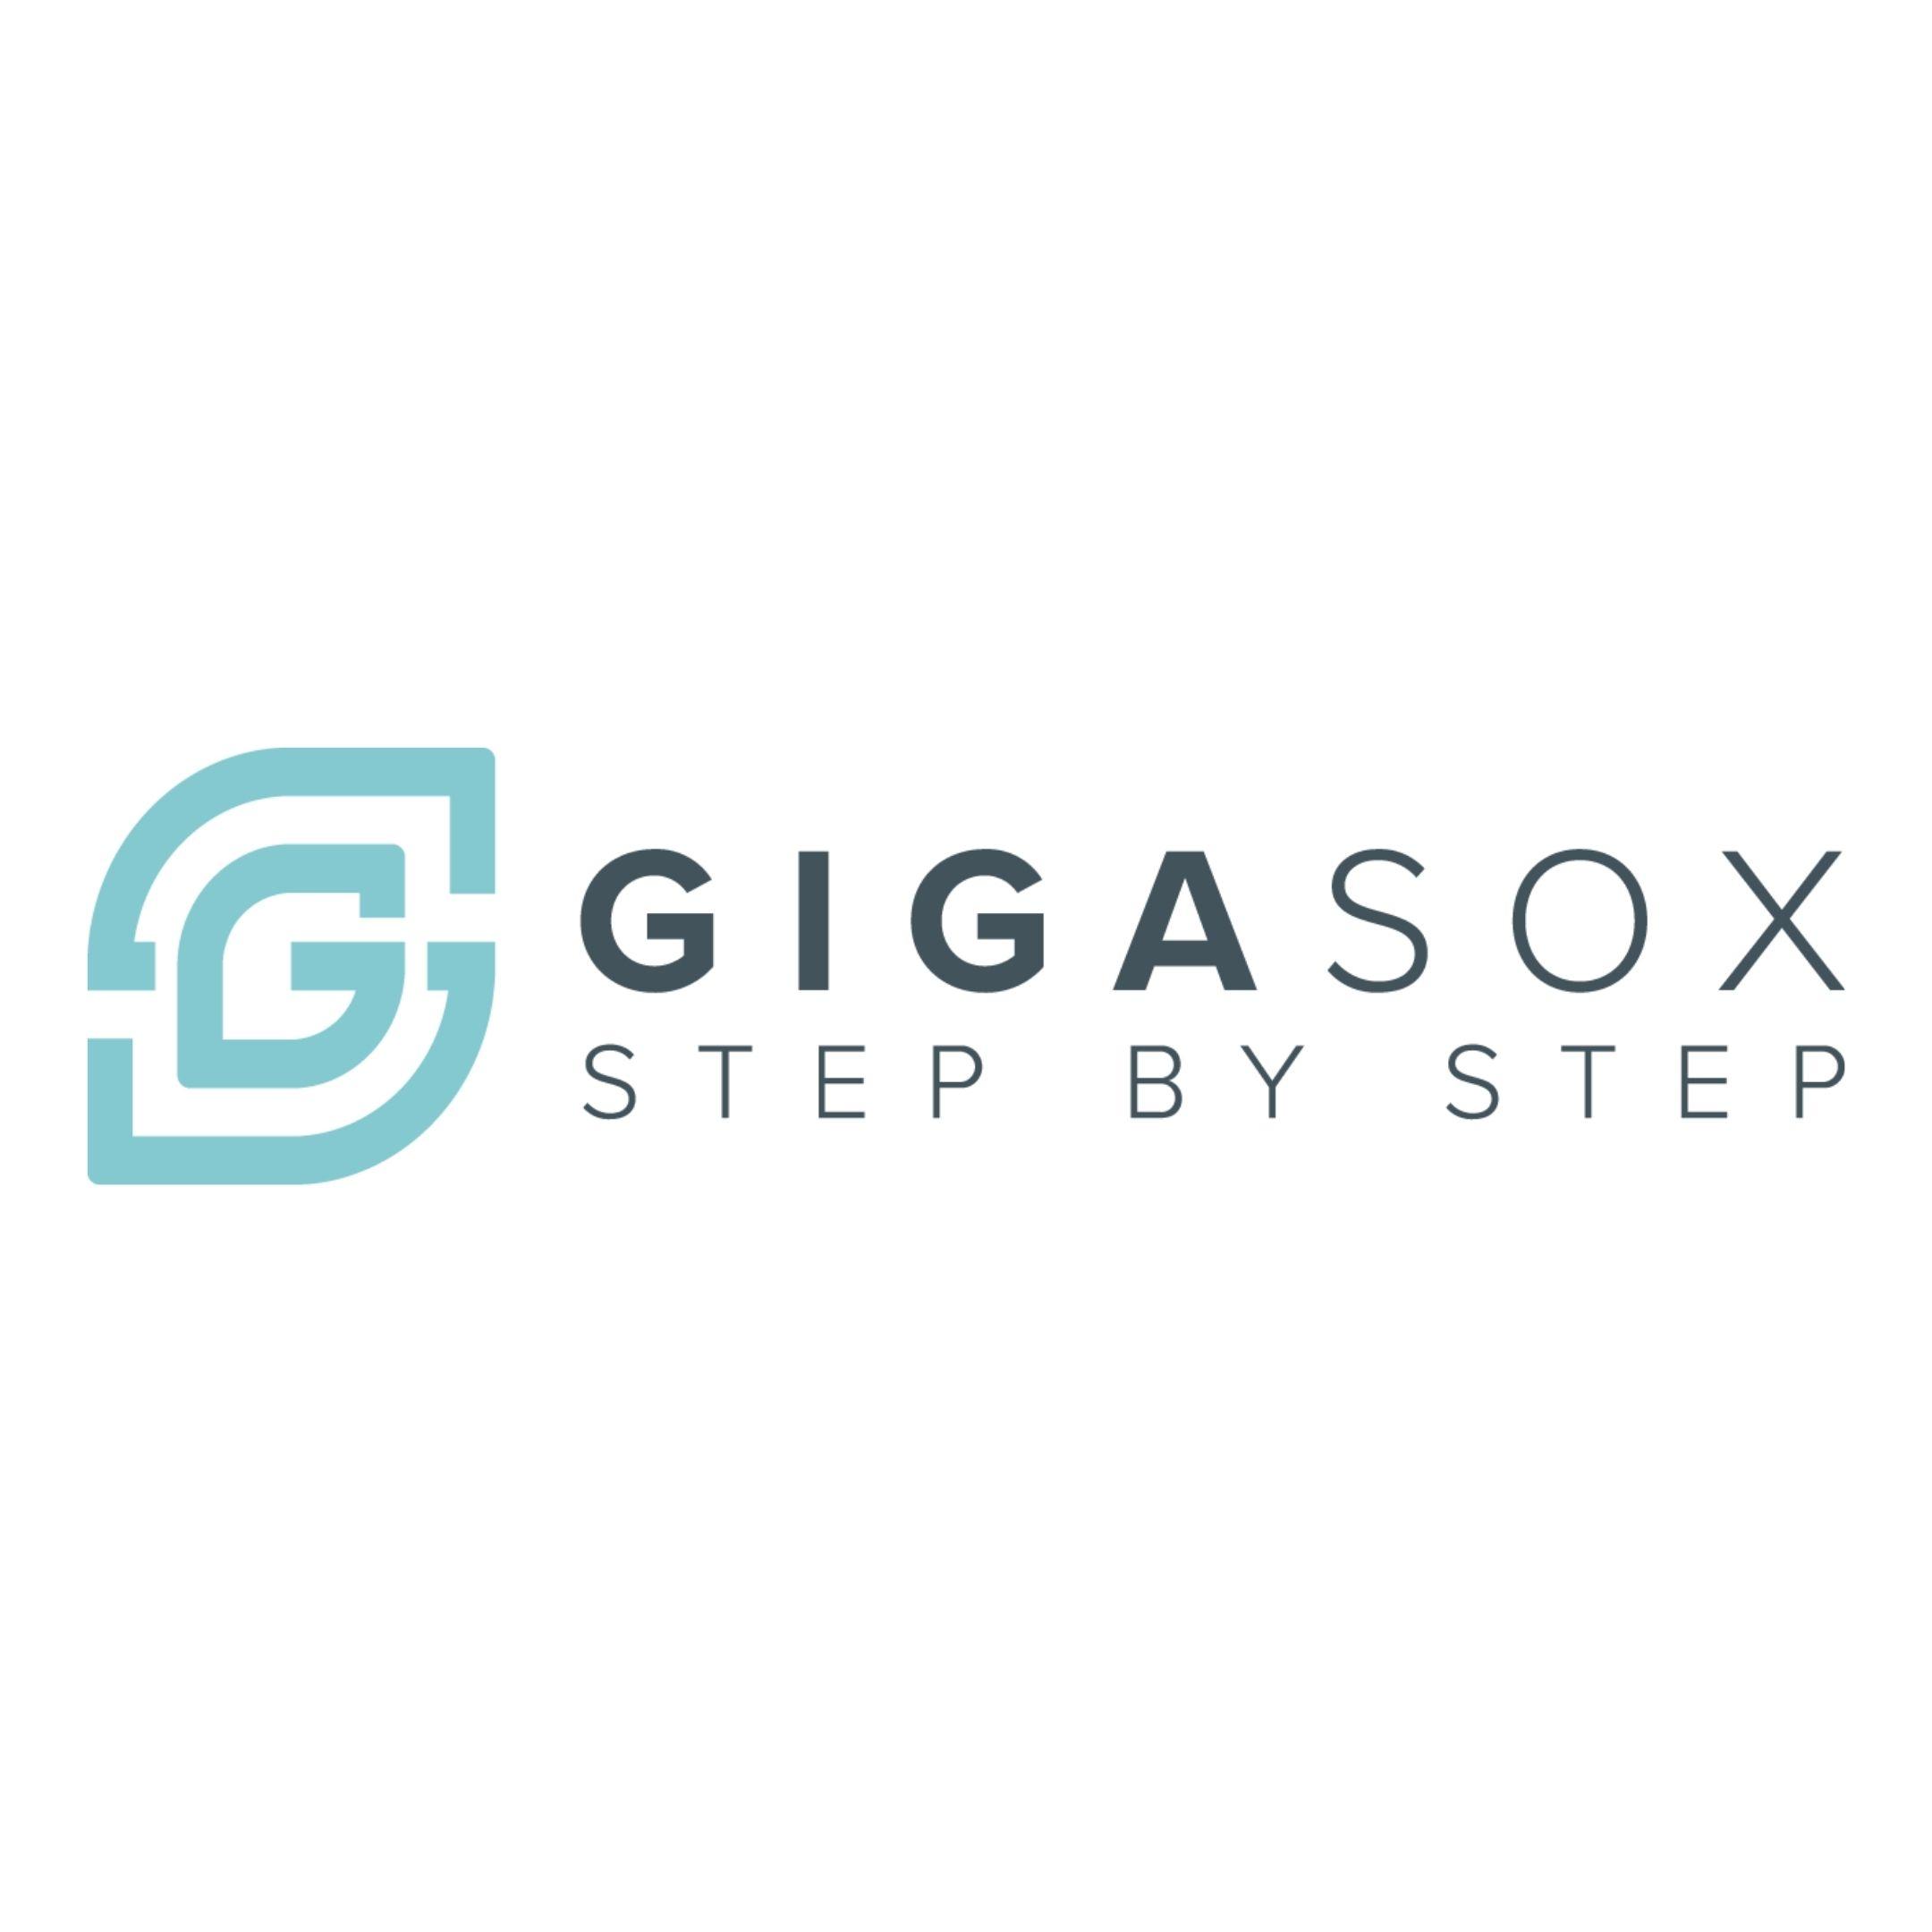 GIGASOX